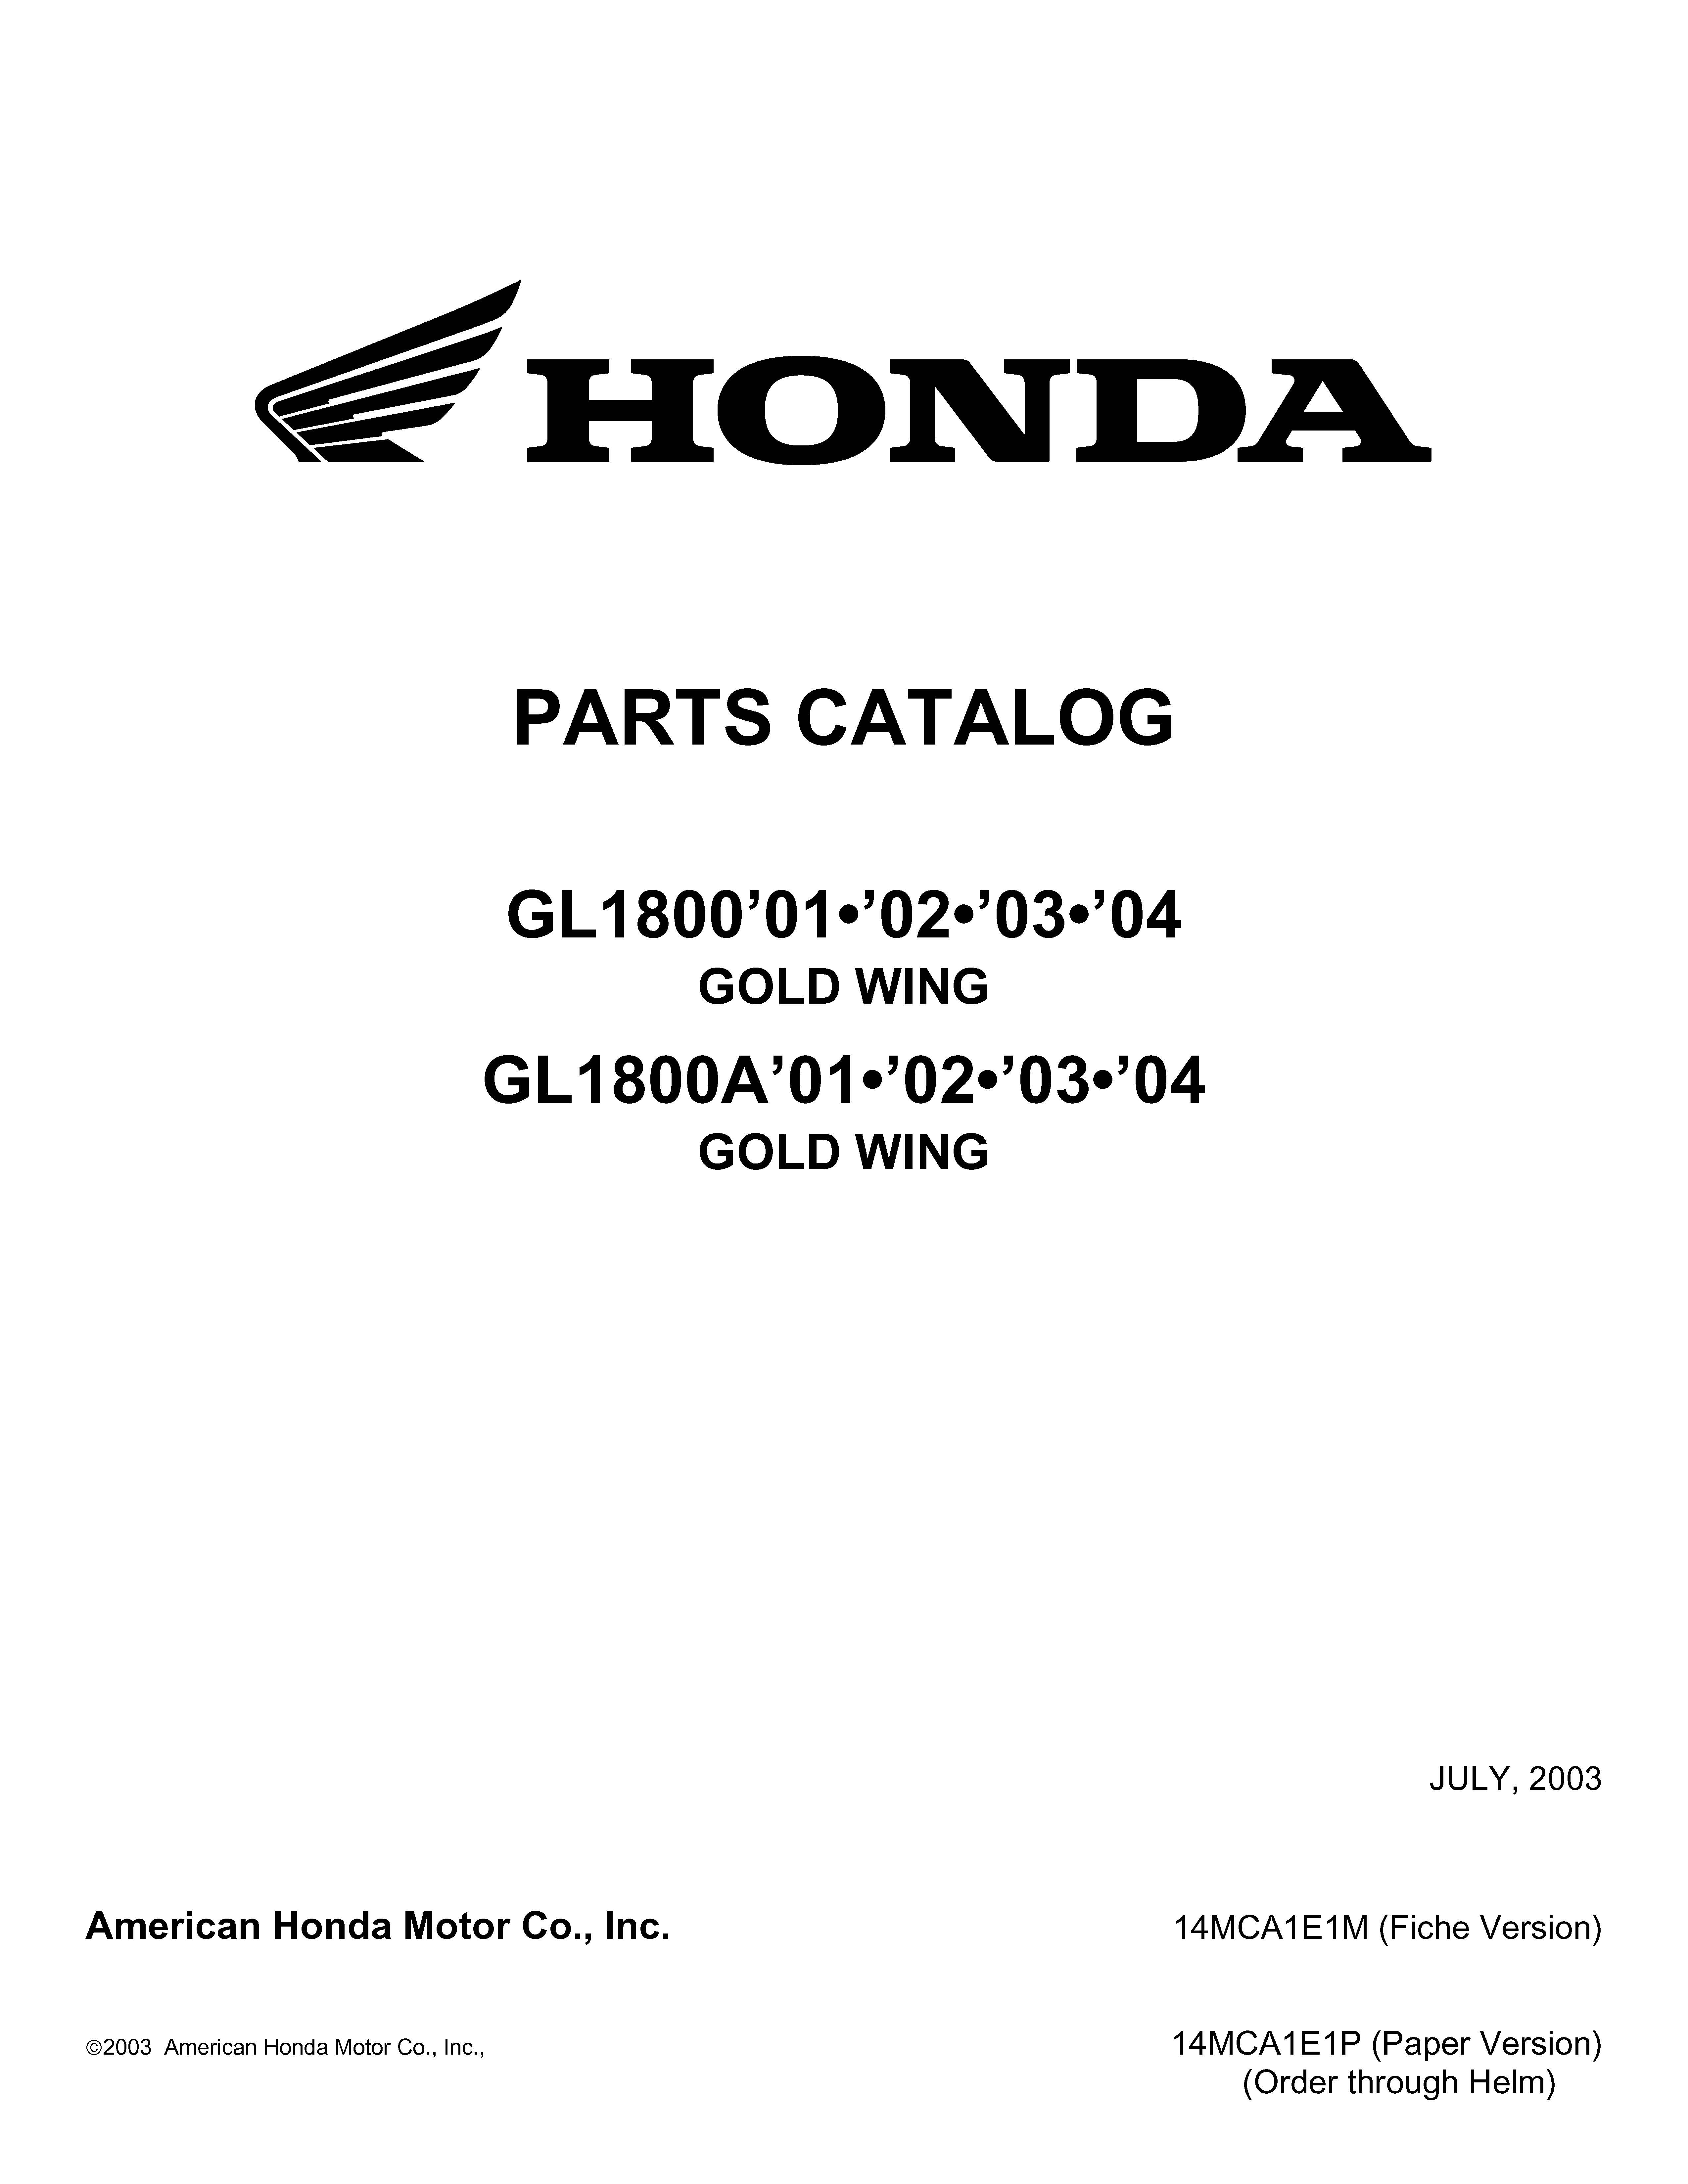 Parts list for Honda GL1800 (2001-2004)